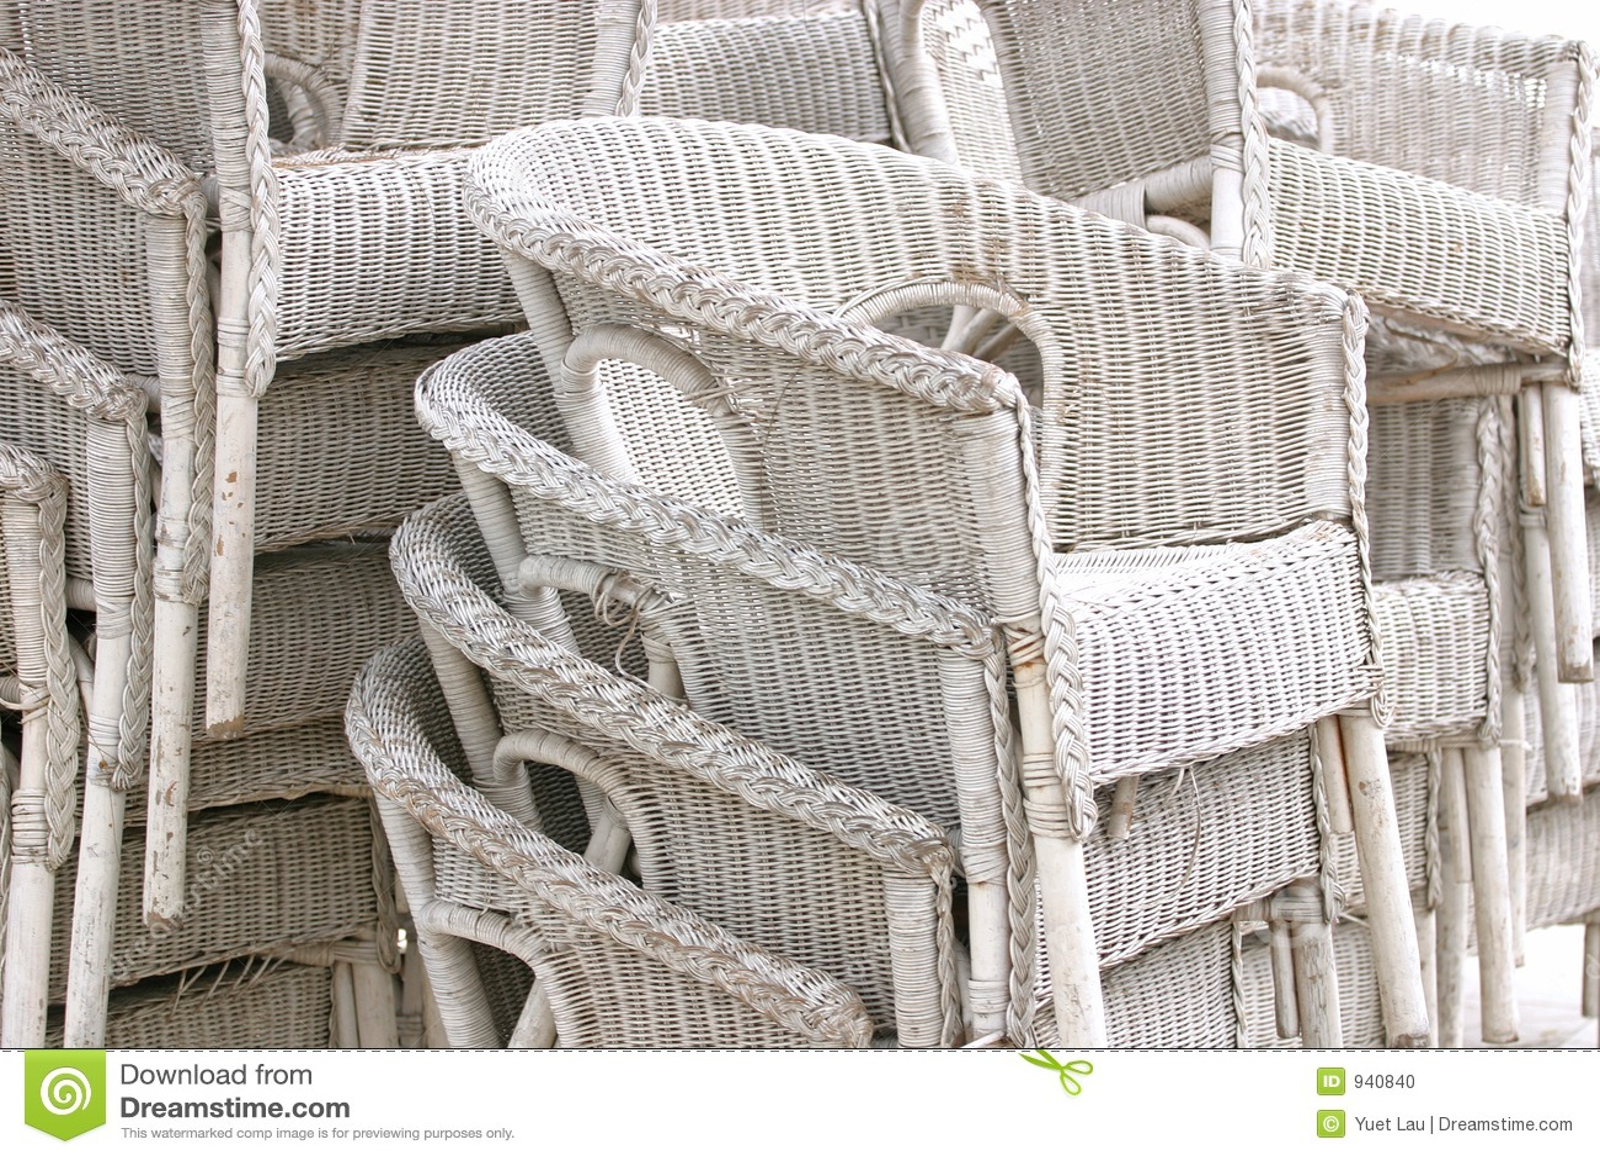 White Rattan Chairs Stock Photo Image 940840